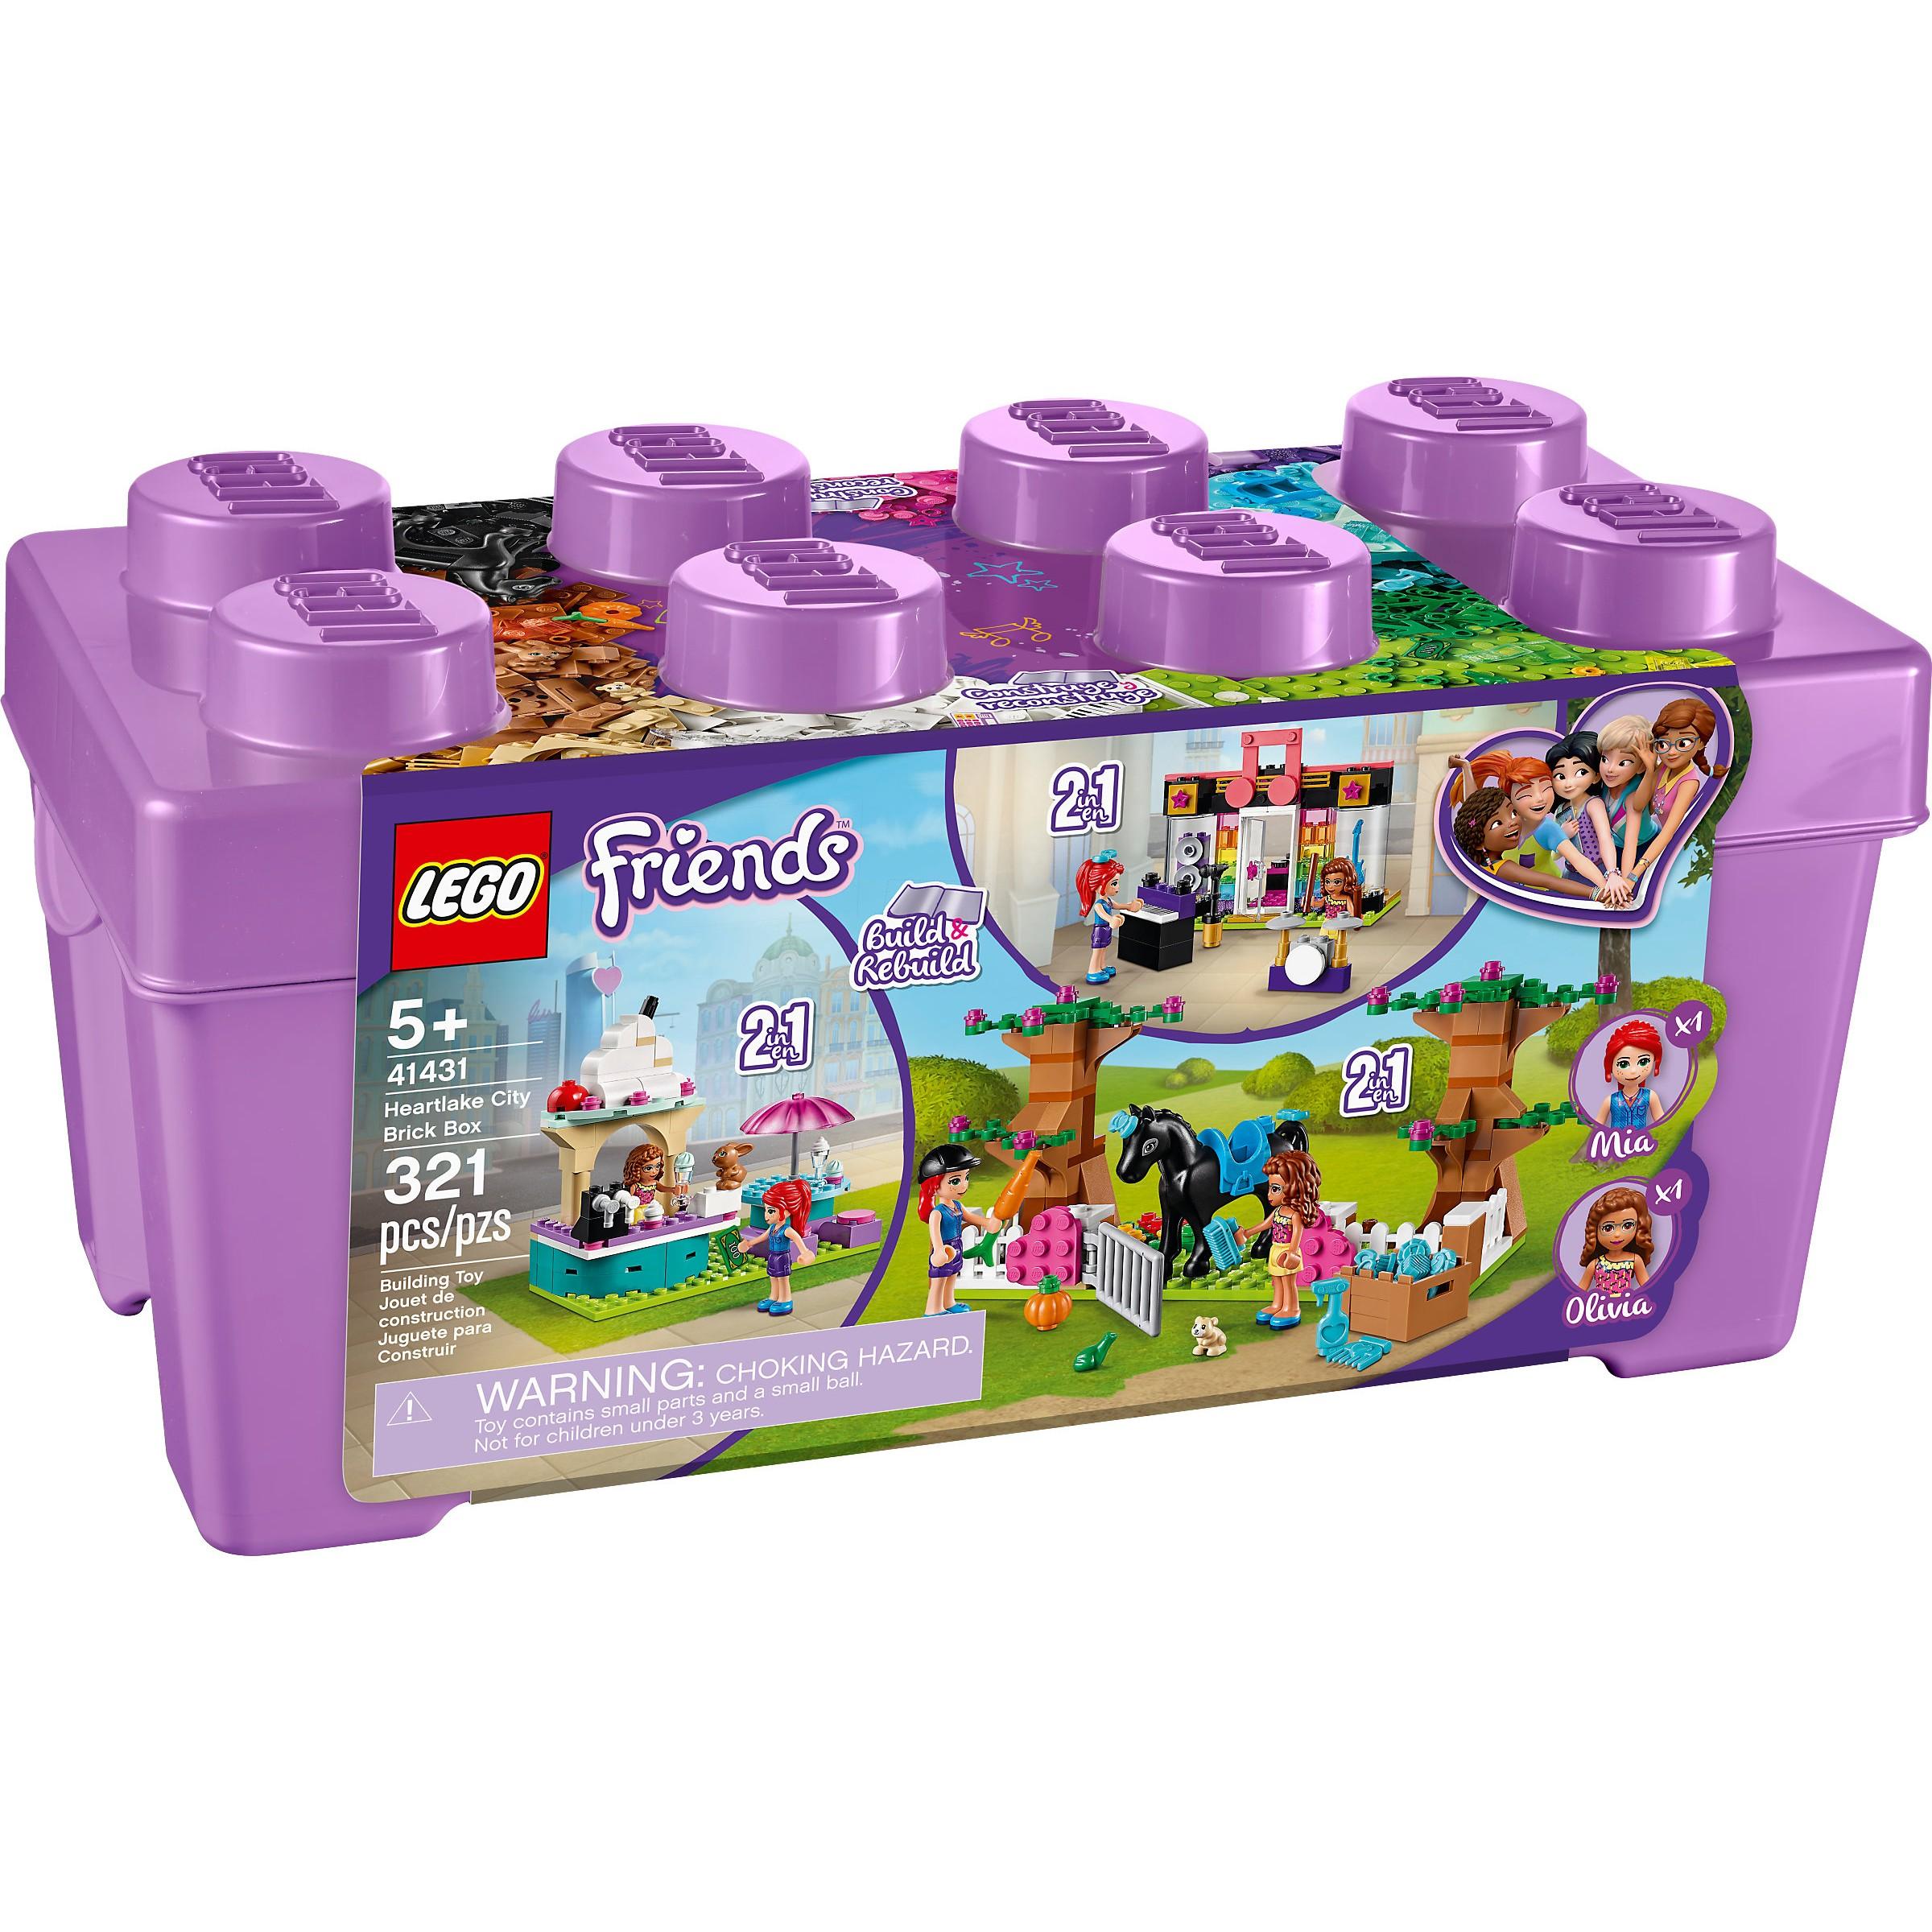 LEGO 41431 Friends Heartlake City Brick Box at Toys R Us